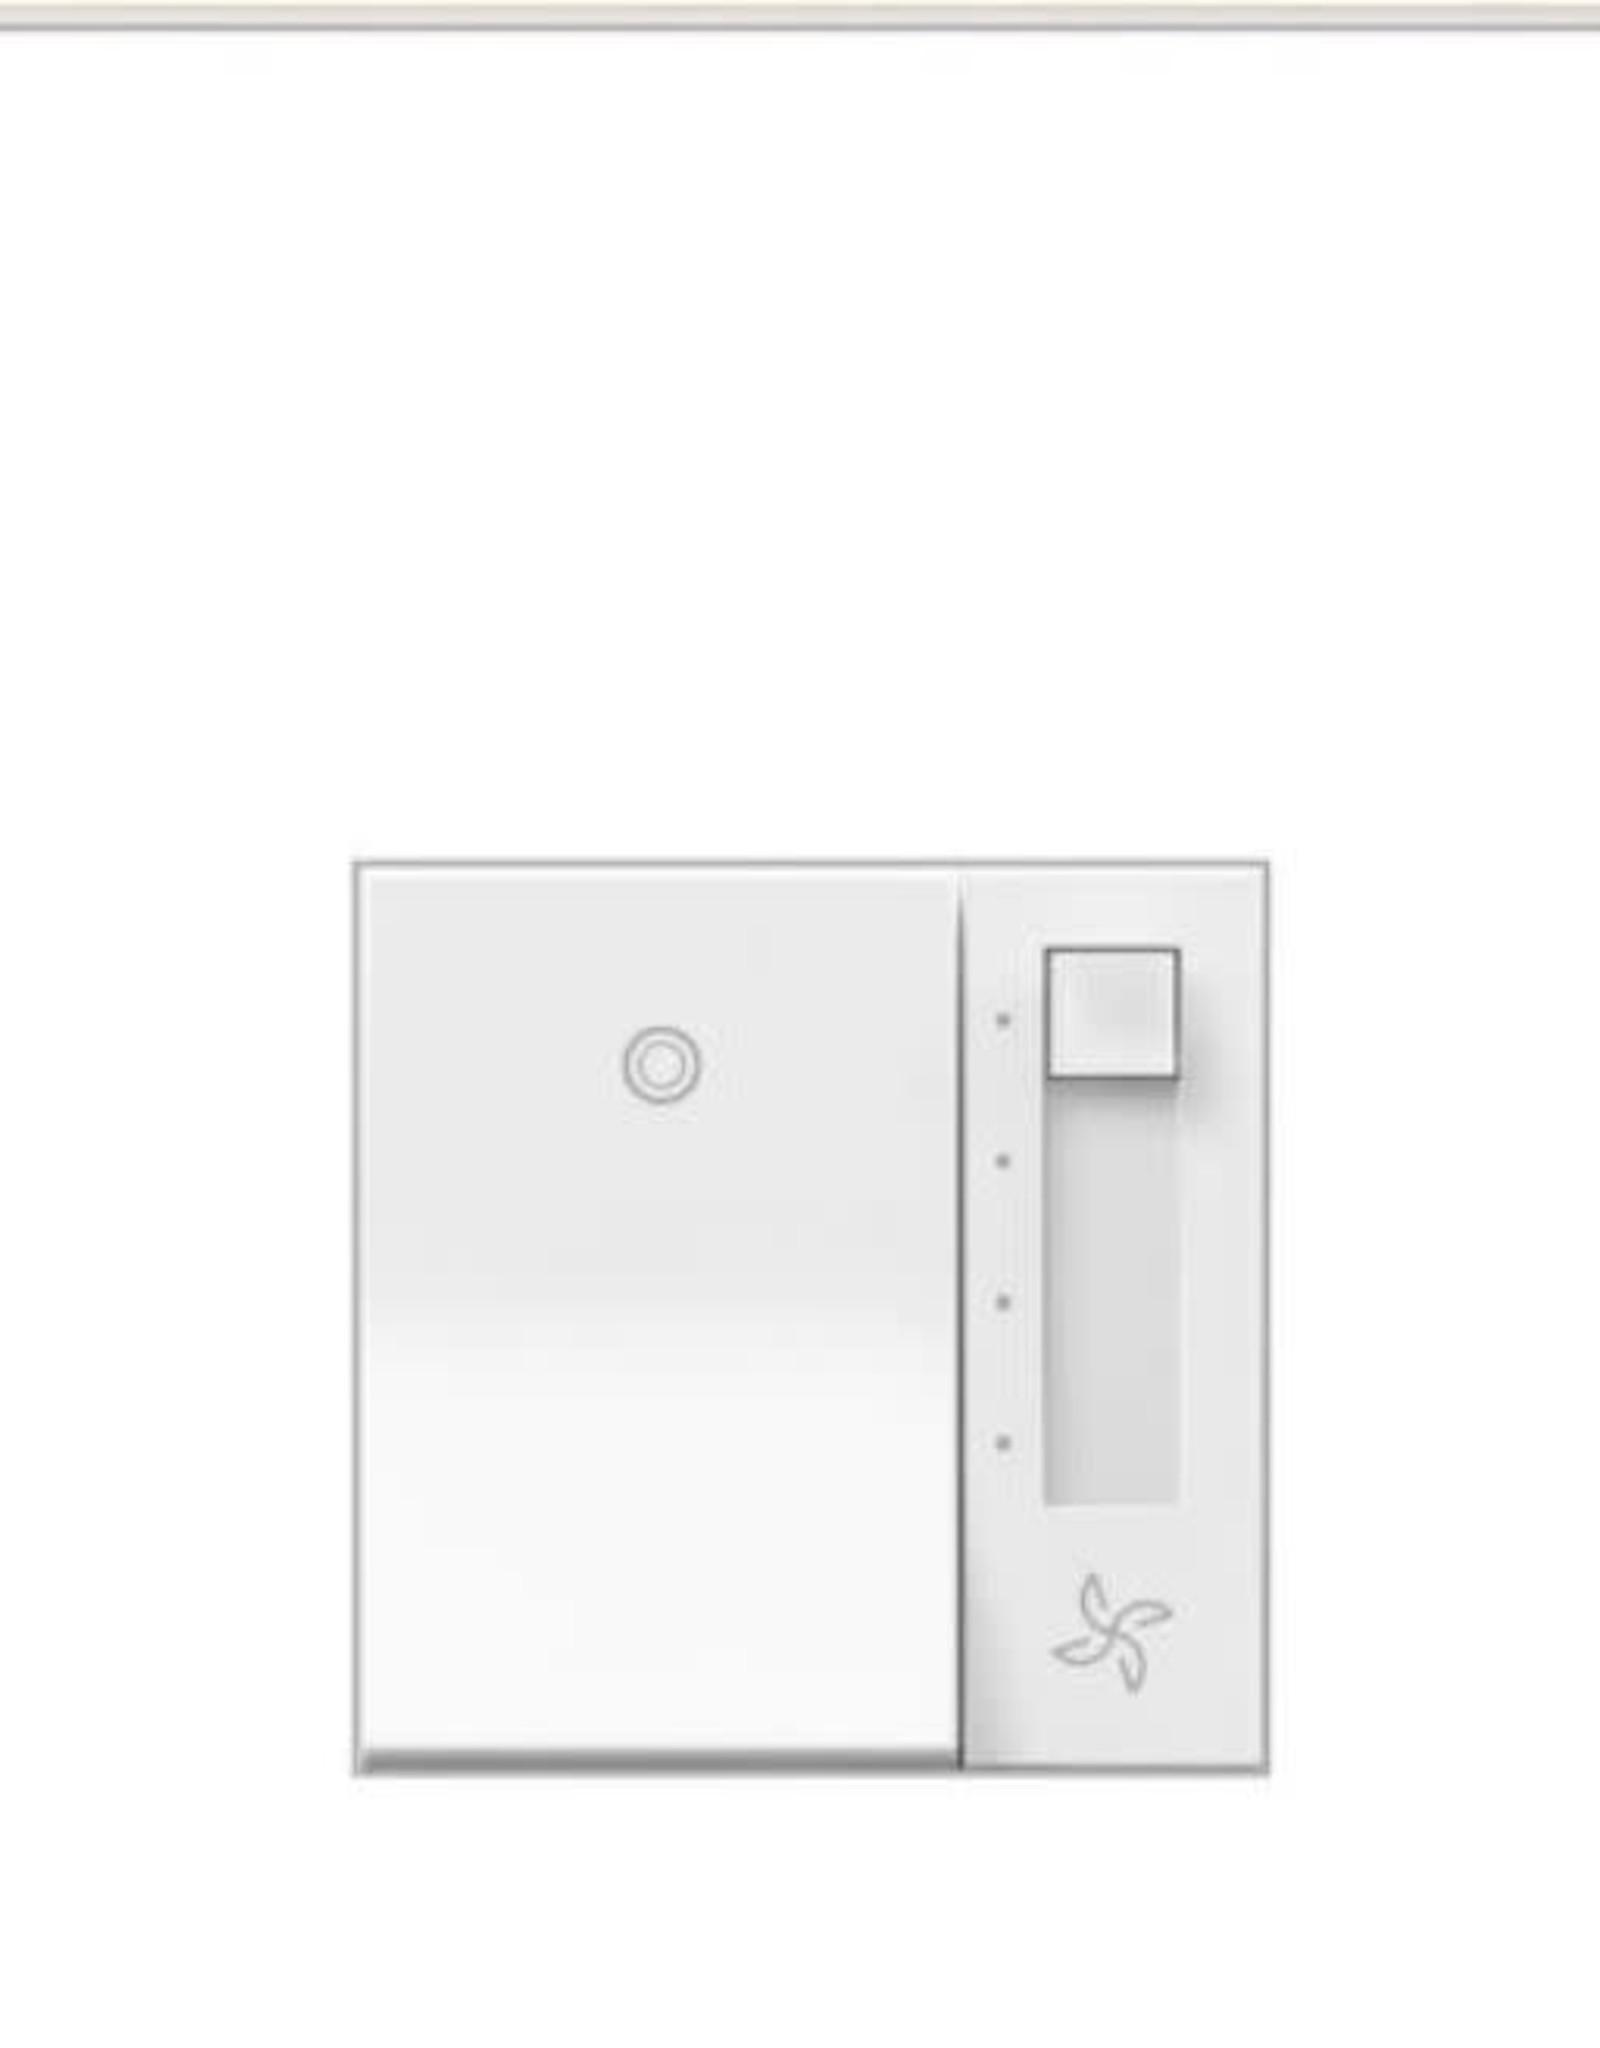 Legrand adorne Paddle 1.6 Amp 4-Speed Fan Control, White